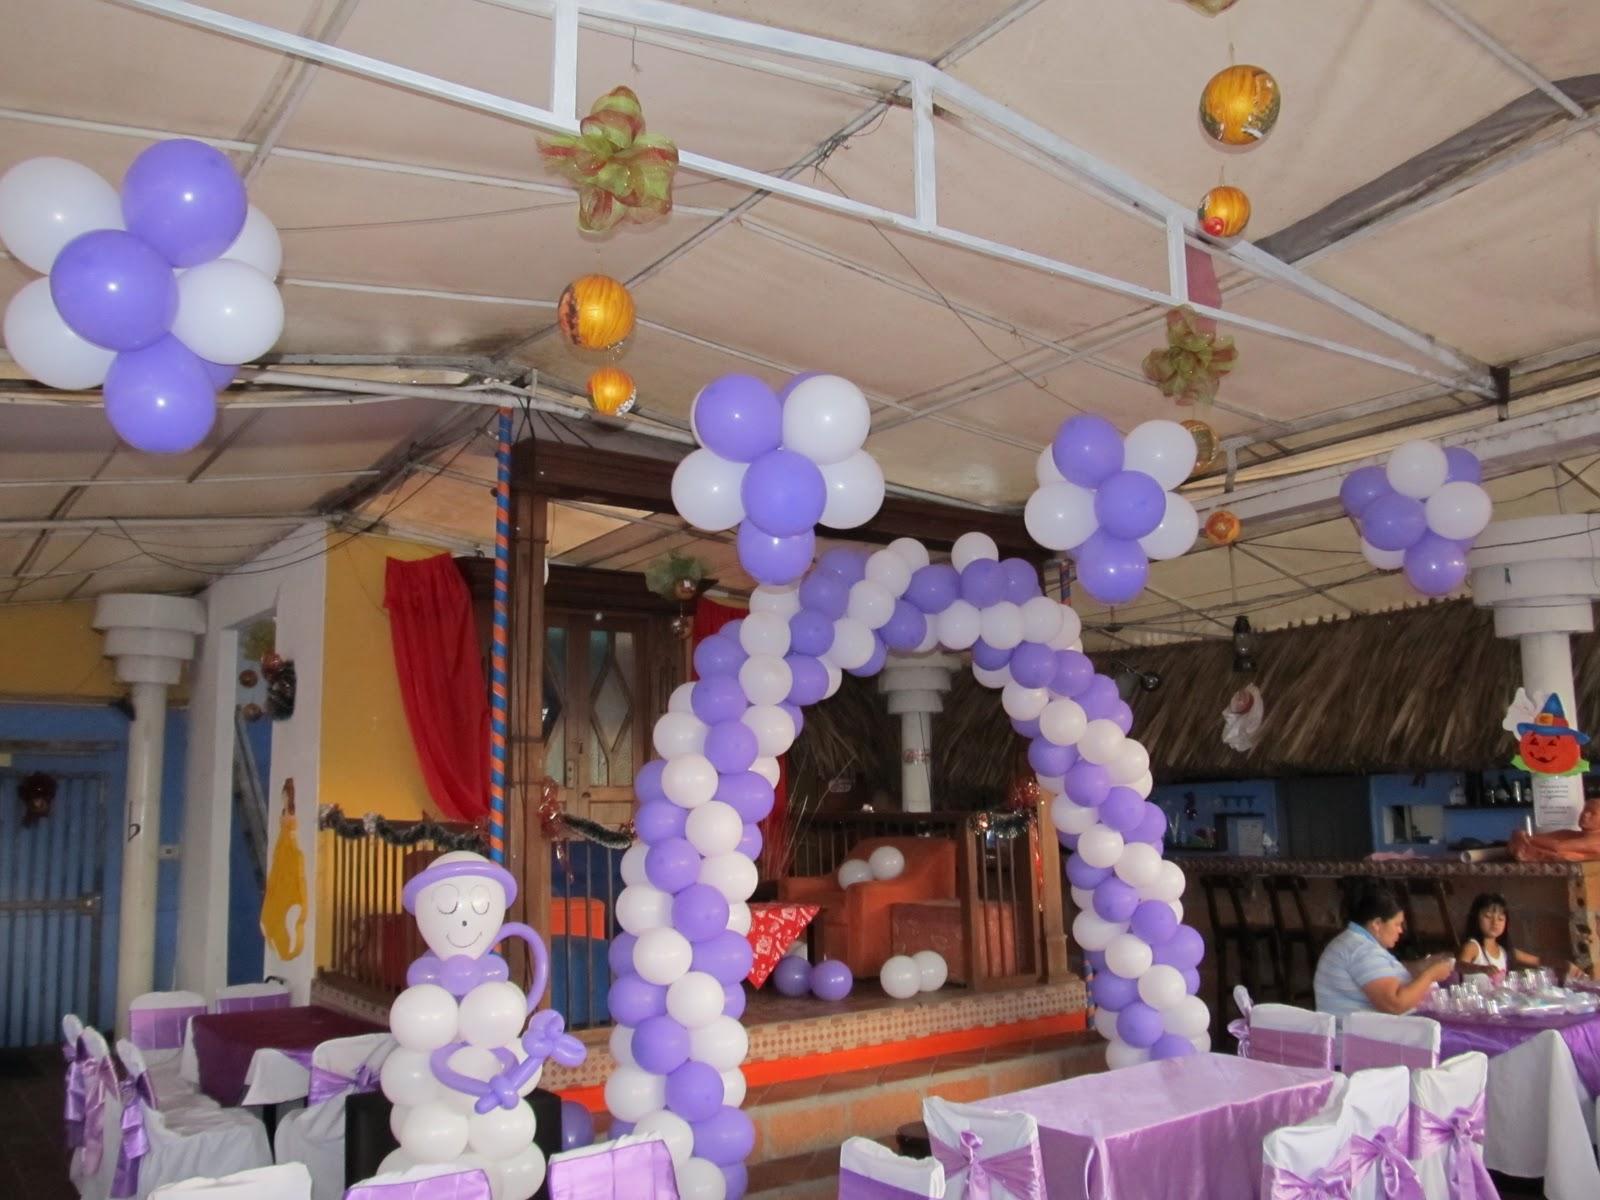 Decoracion con globos primera comunion recreacionistas - Decoracion fiesta comunion ...